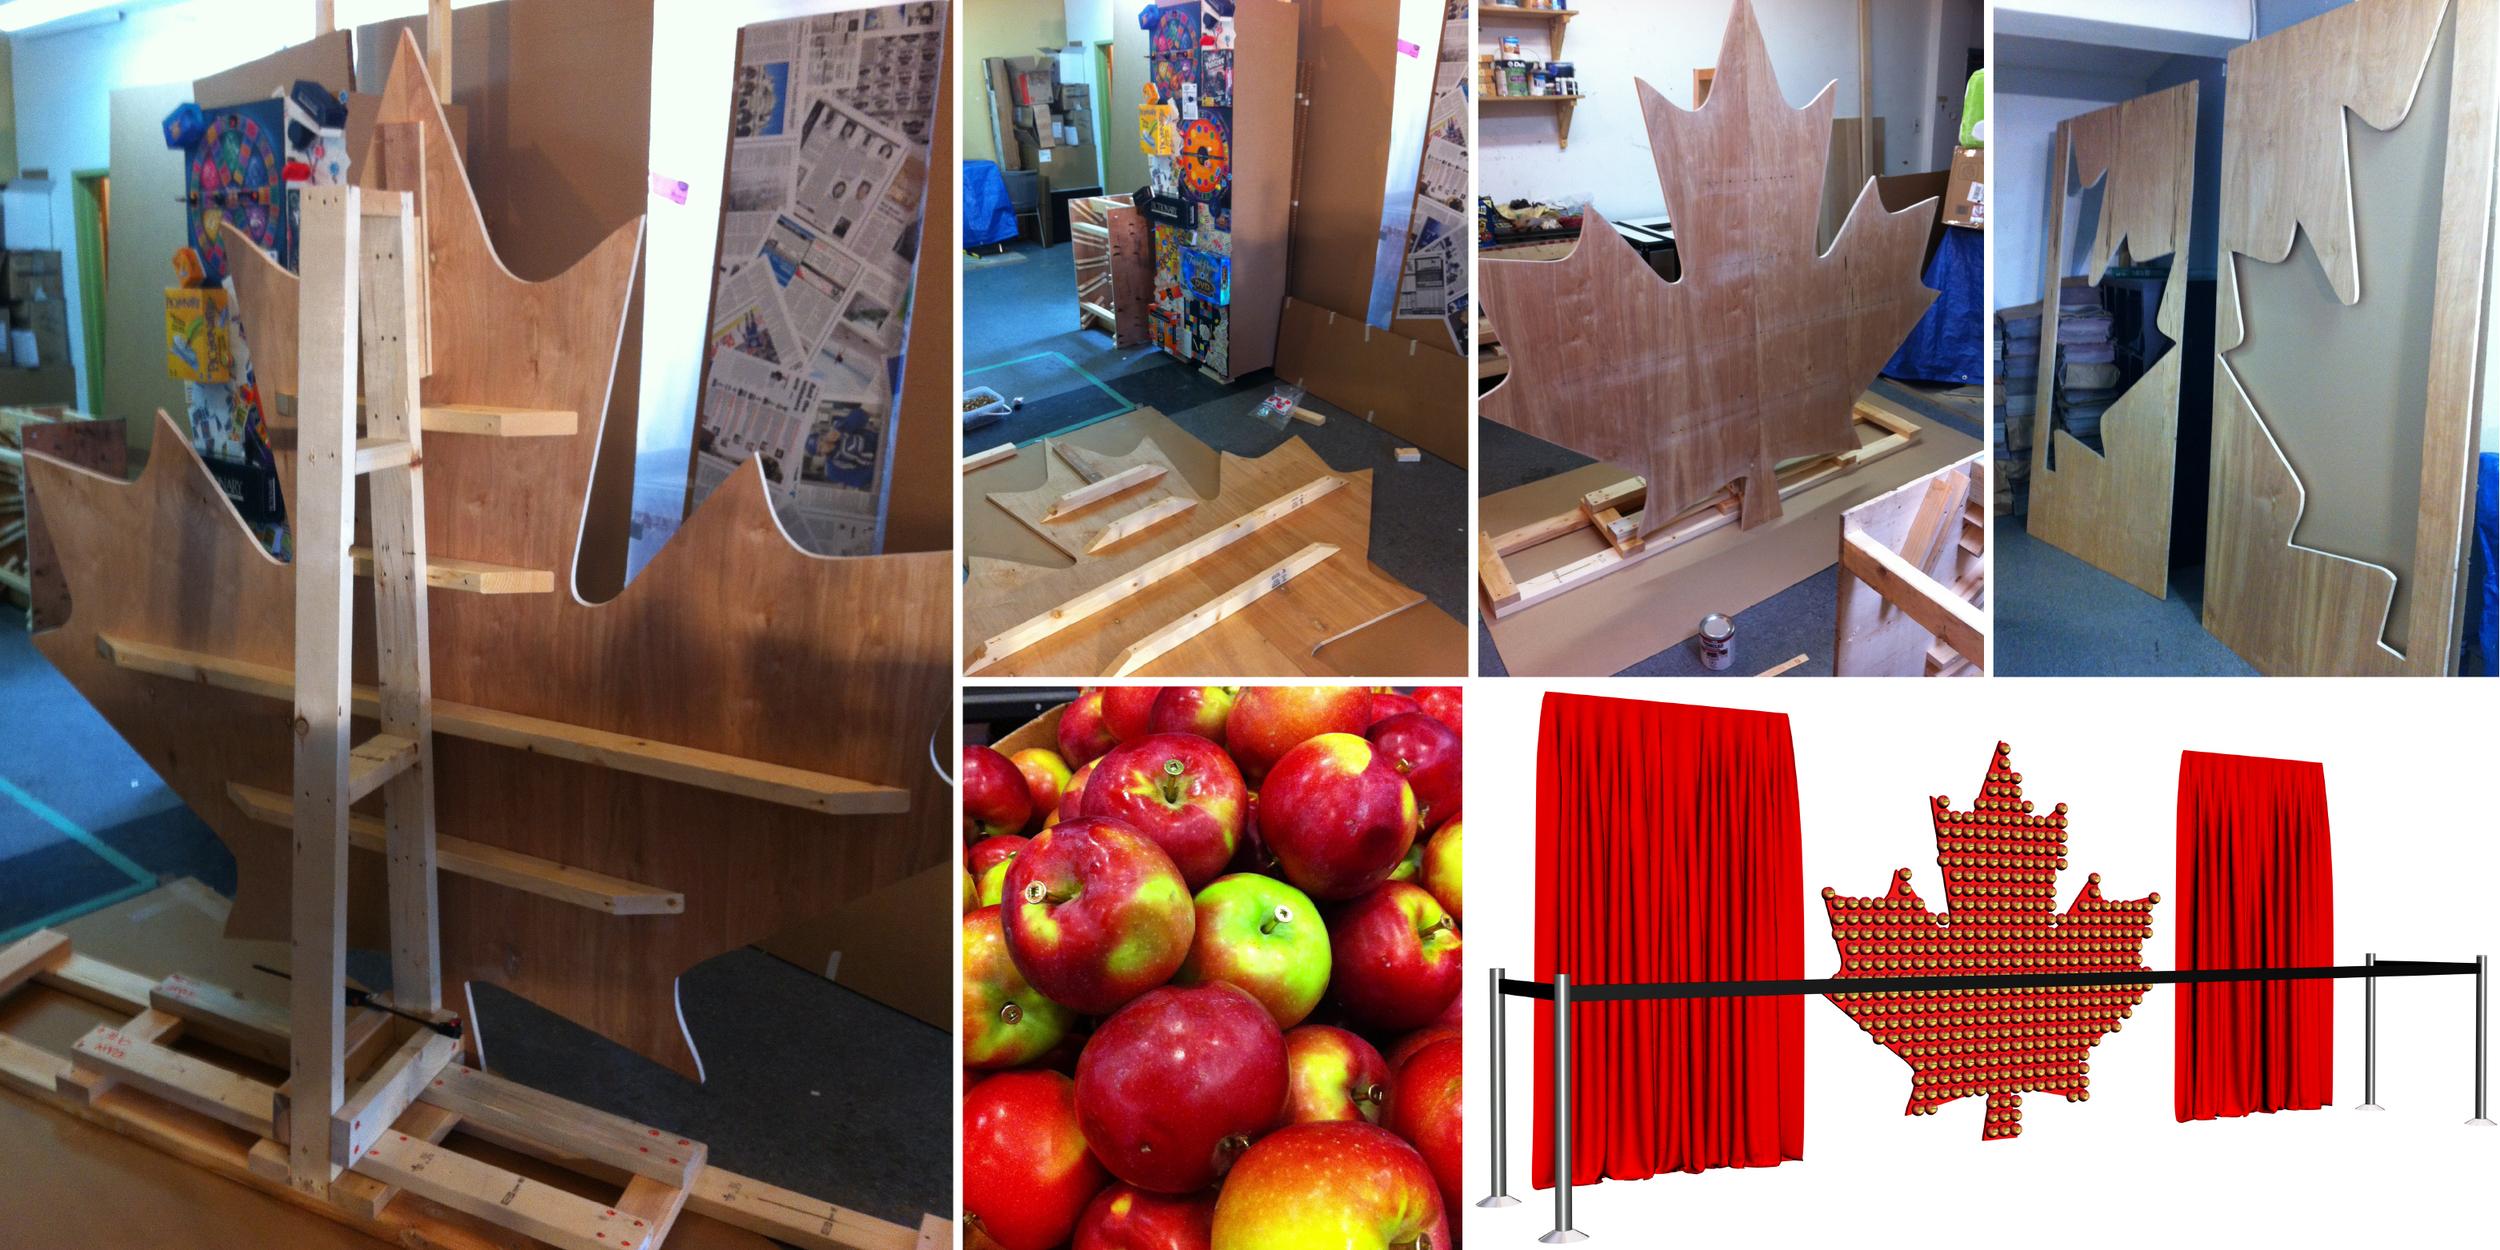 McIntosh Apple exhibit – Work in progress